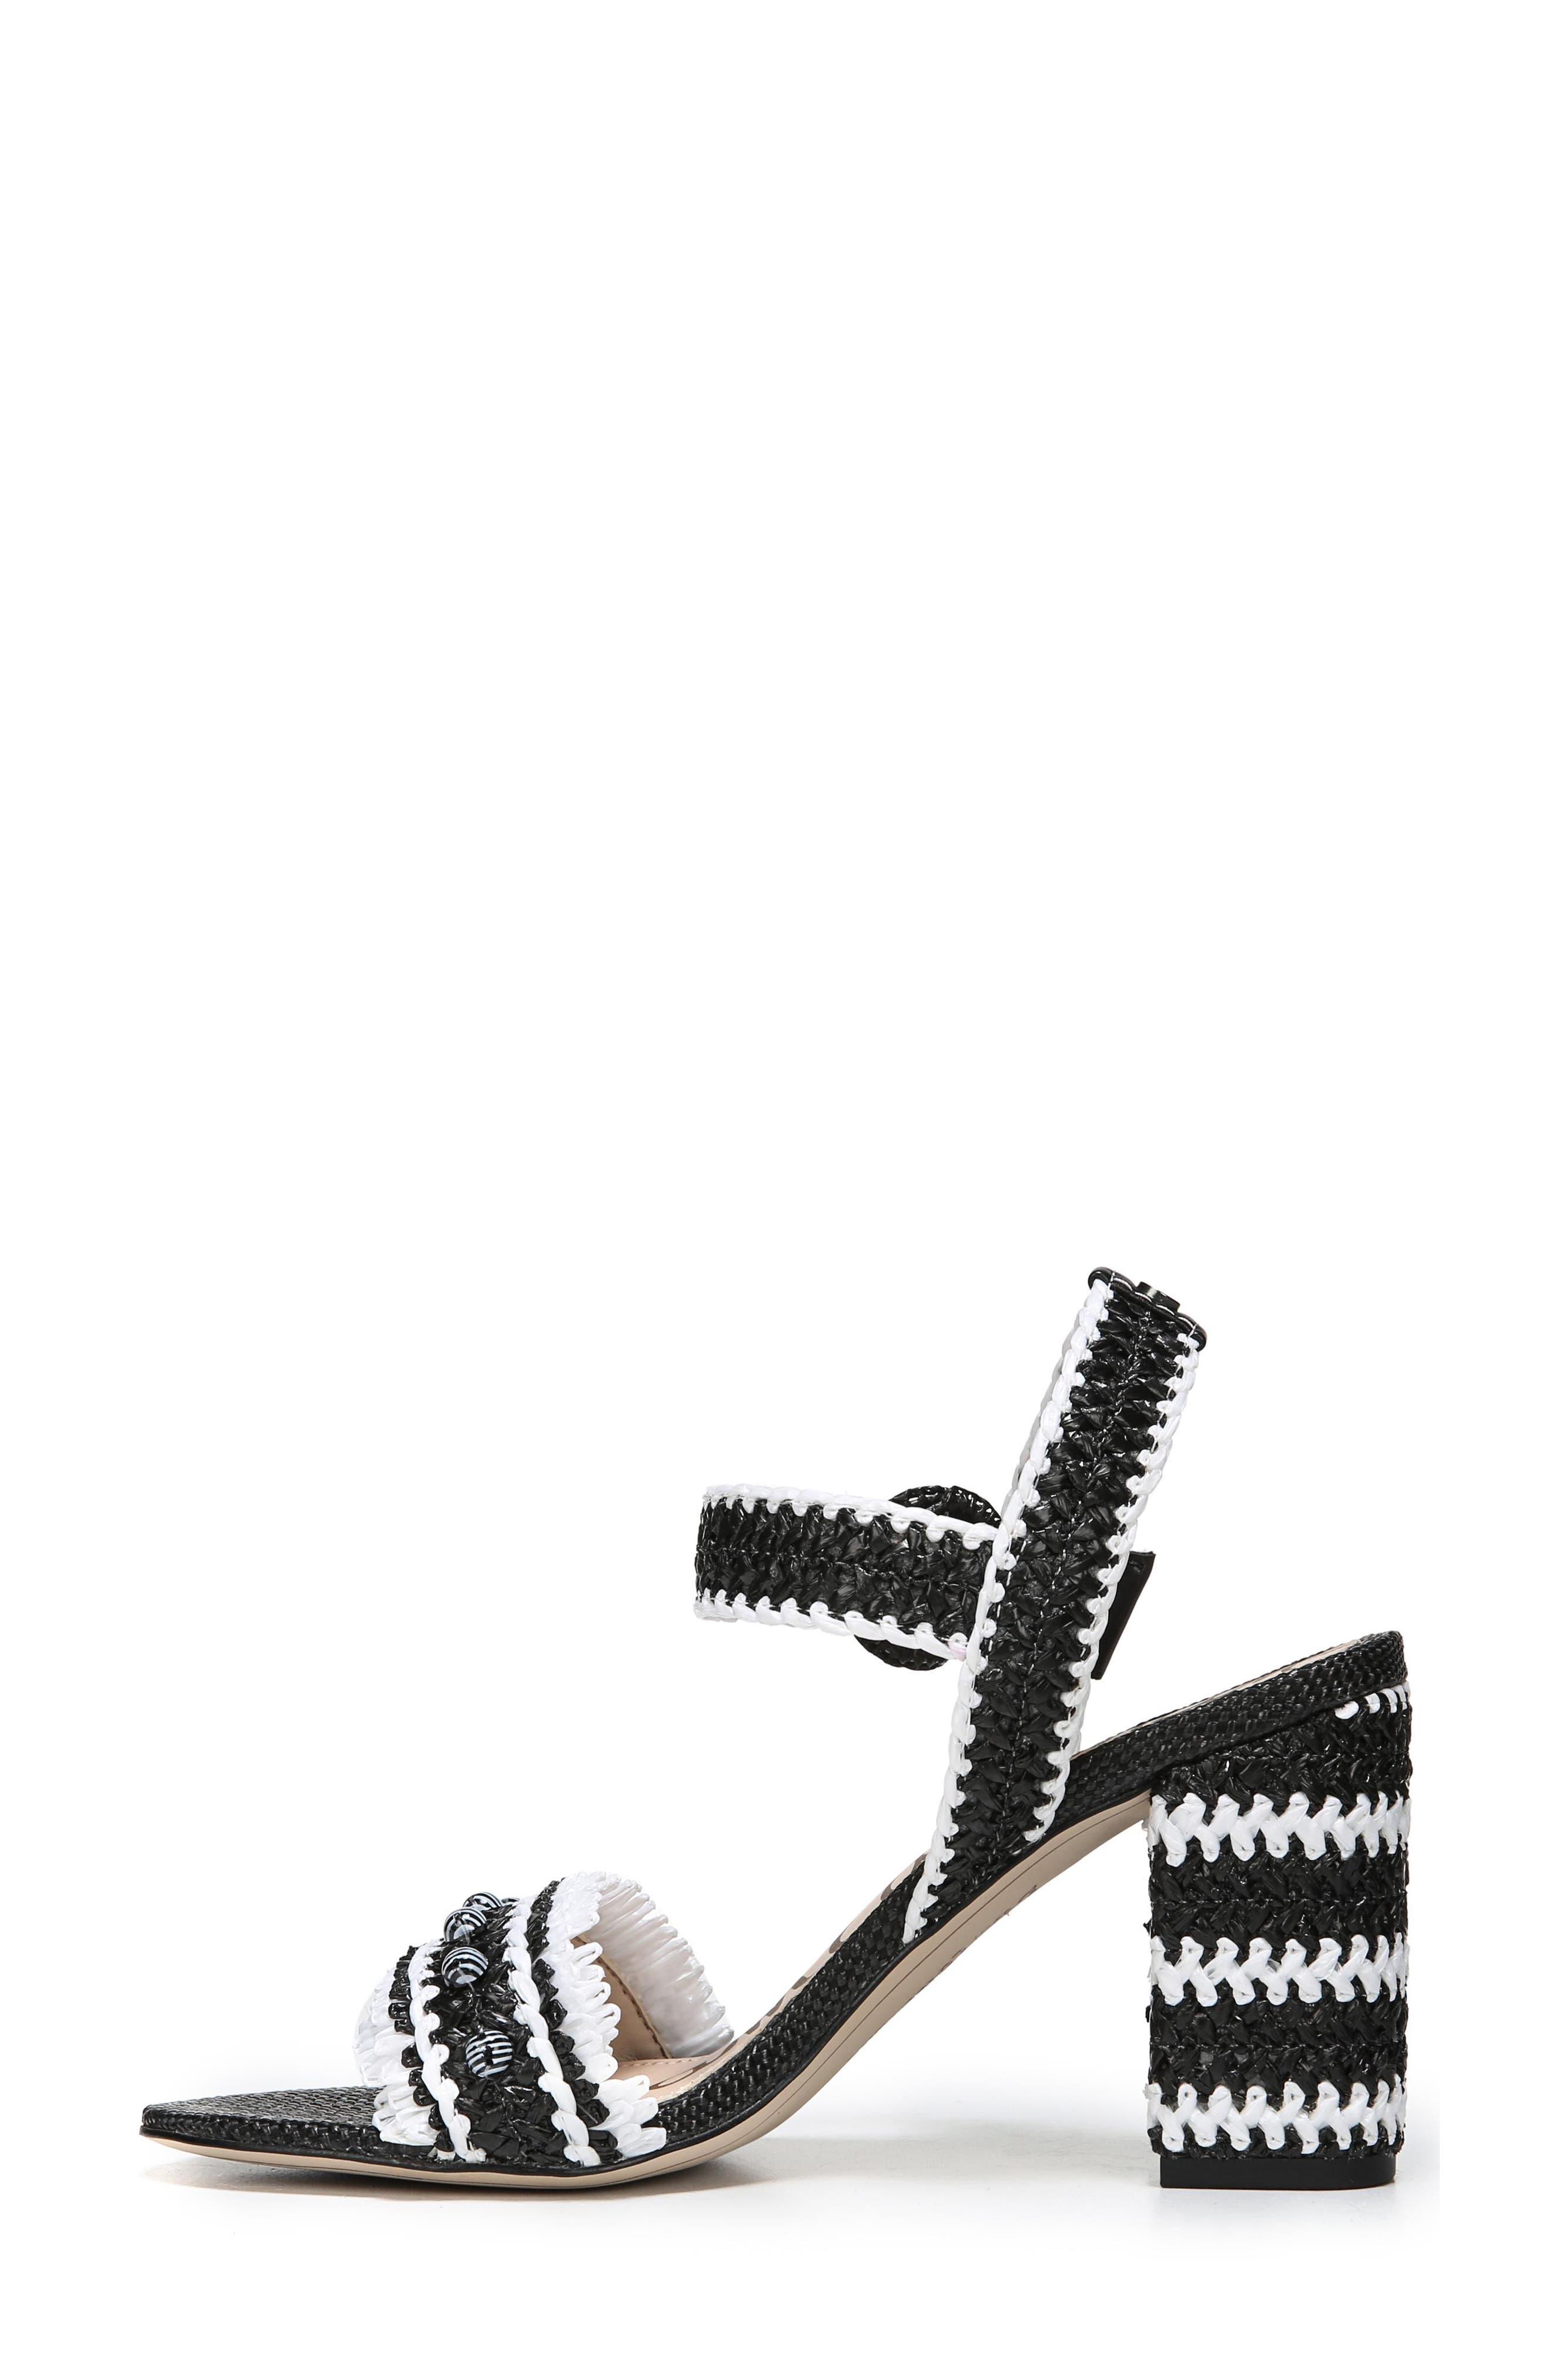 Olisa Block Heel Sandal,                             Alternate thumbnail 3, color,                             001